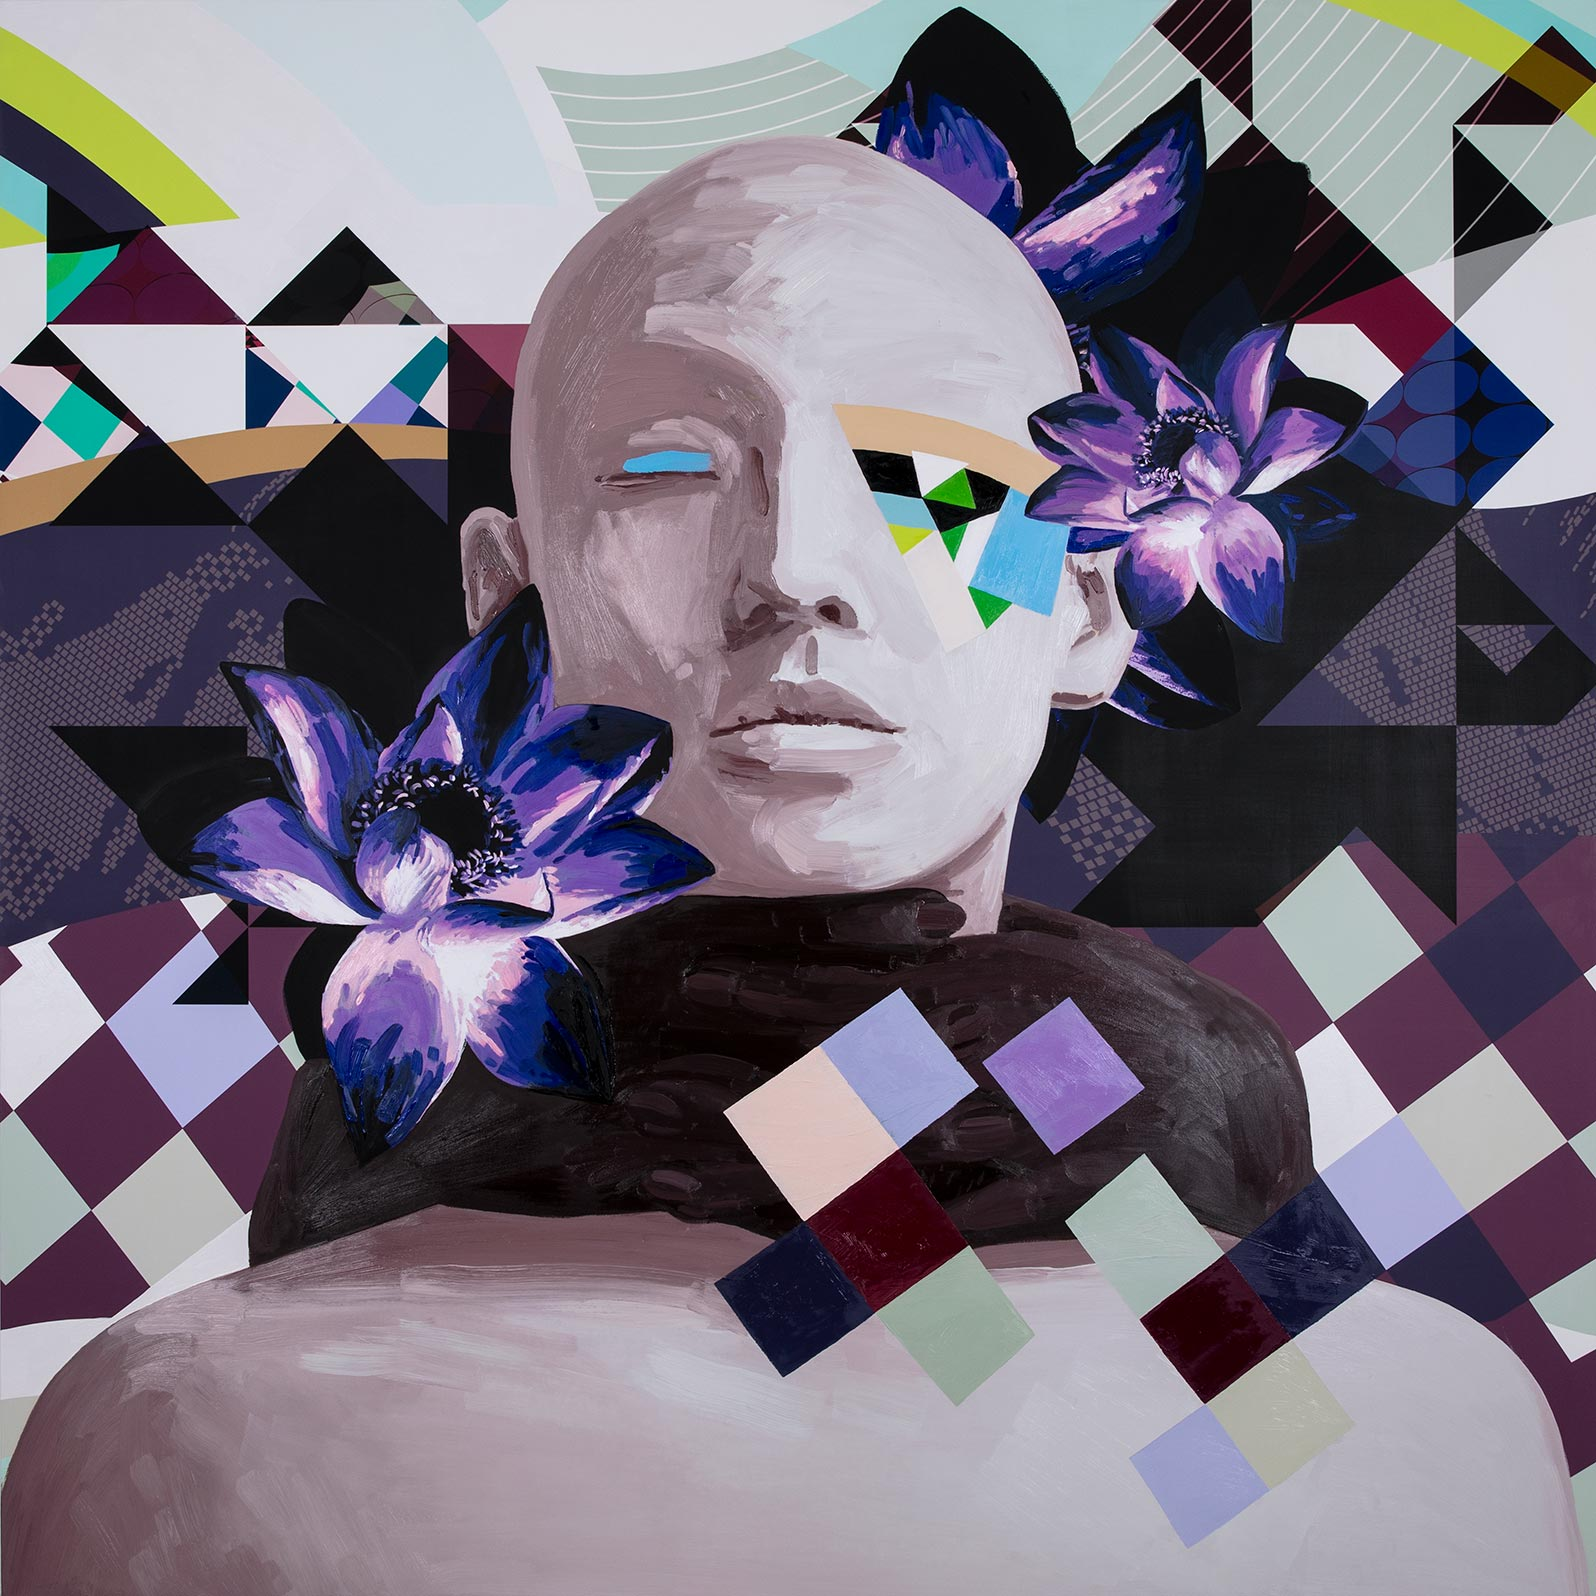 Anca Stefanescu | Mixed Media | Awakening, Modern Art Paintings